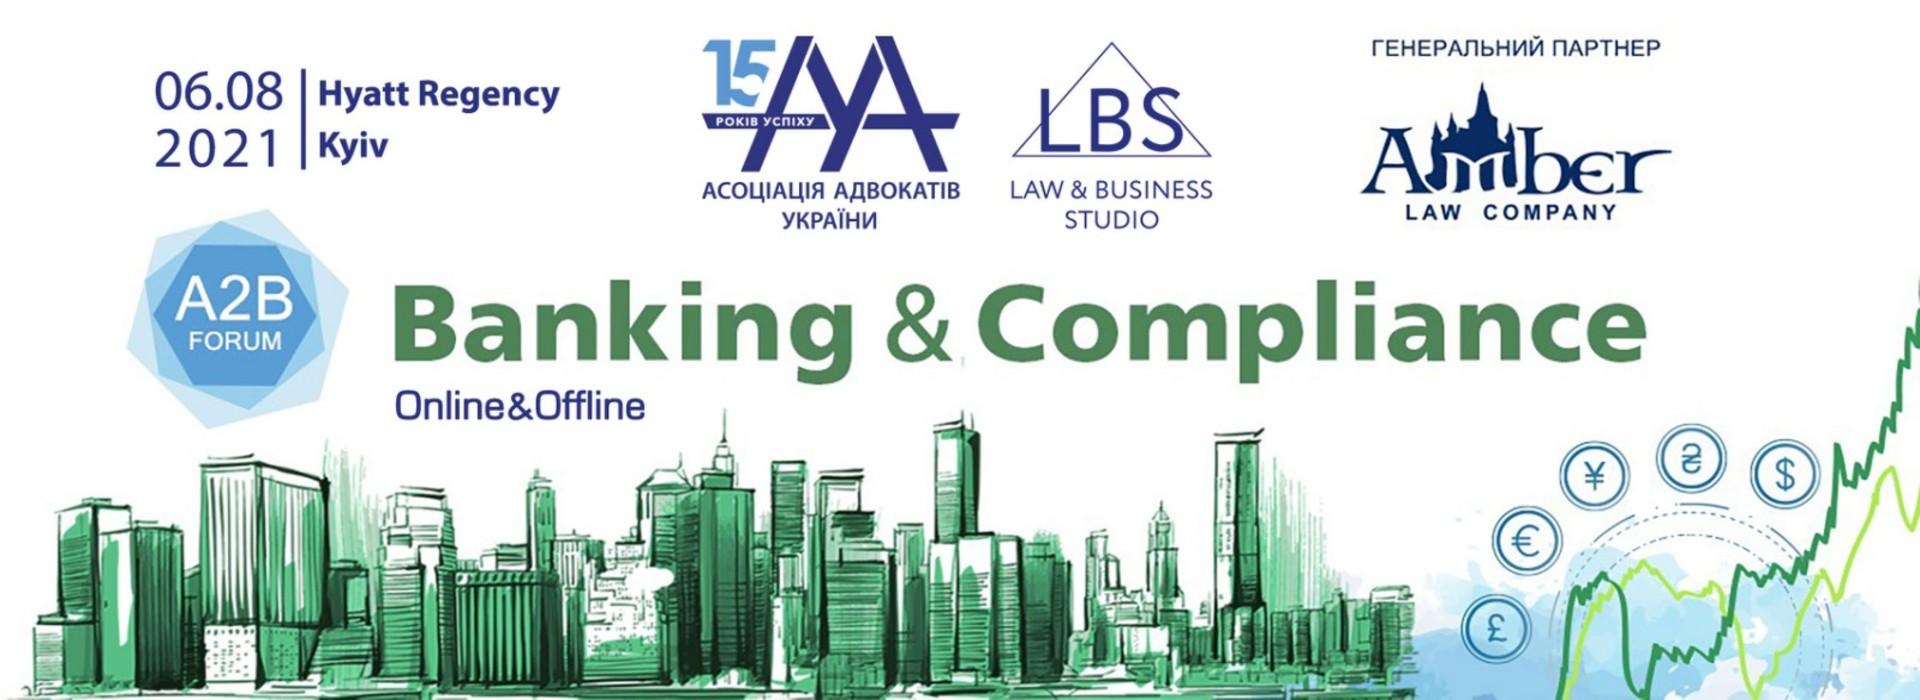 Banking & Compliance 2021 A2B Forum